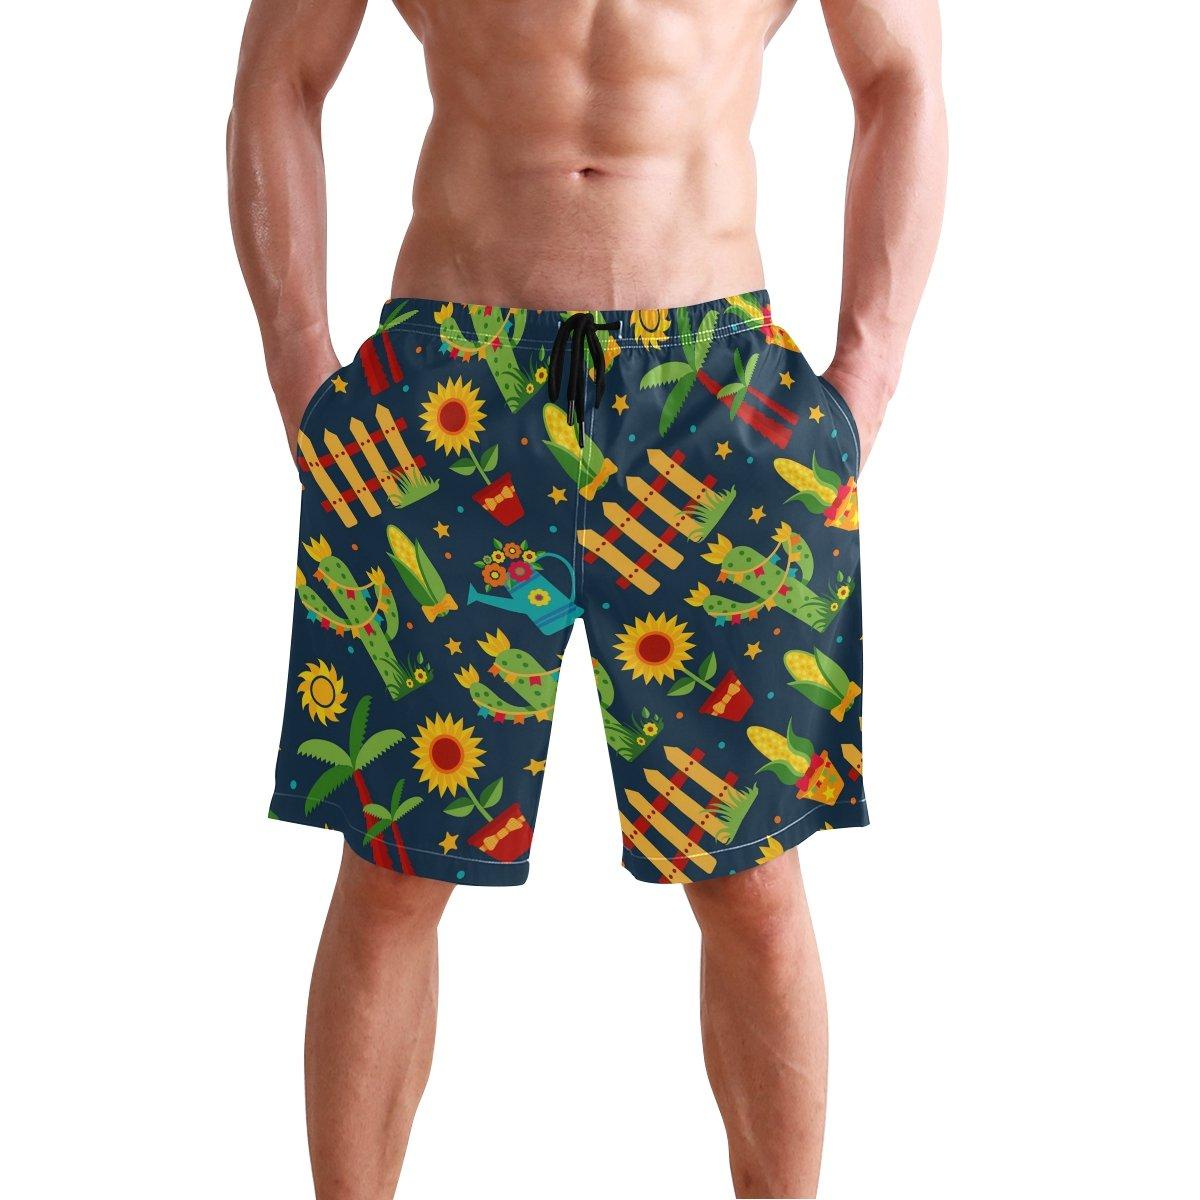 REBACAT Plants Cactus Sunflowers Mens Swim Trunks Quick Dry Beach Board Shorts with Drawstring Pocket